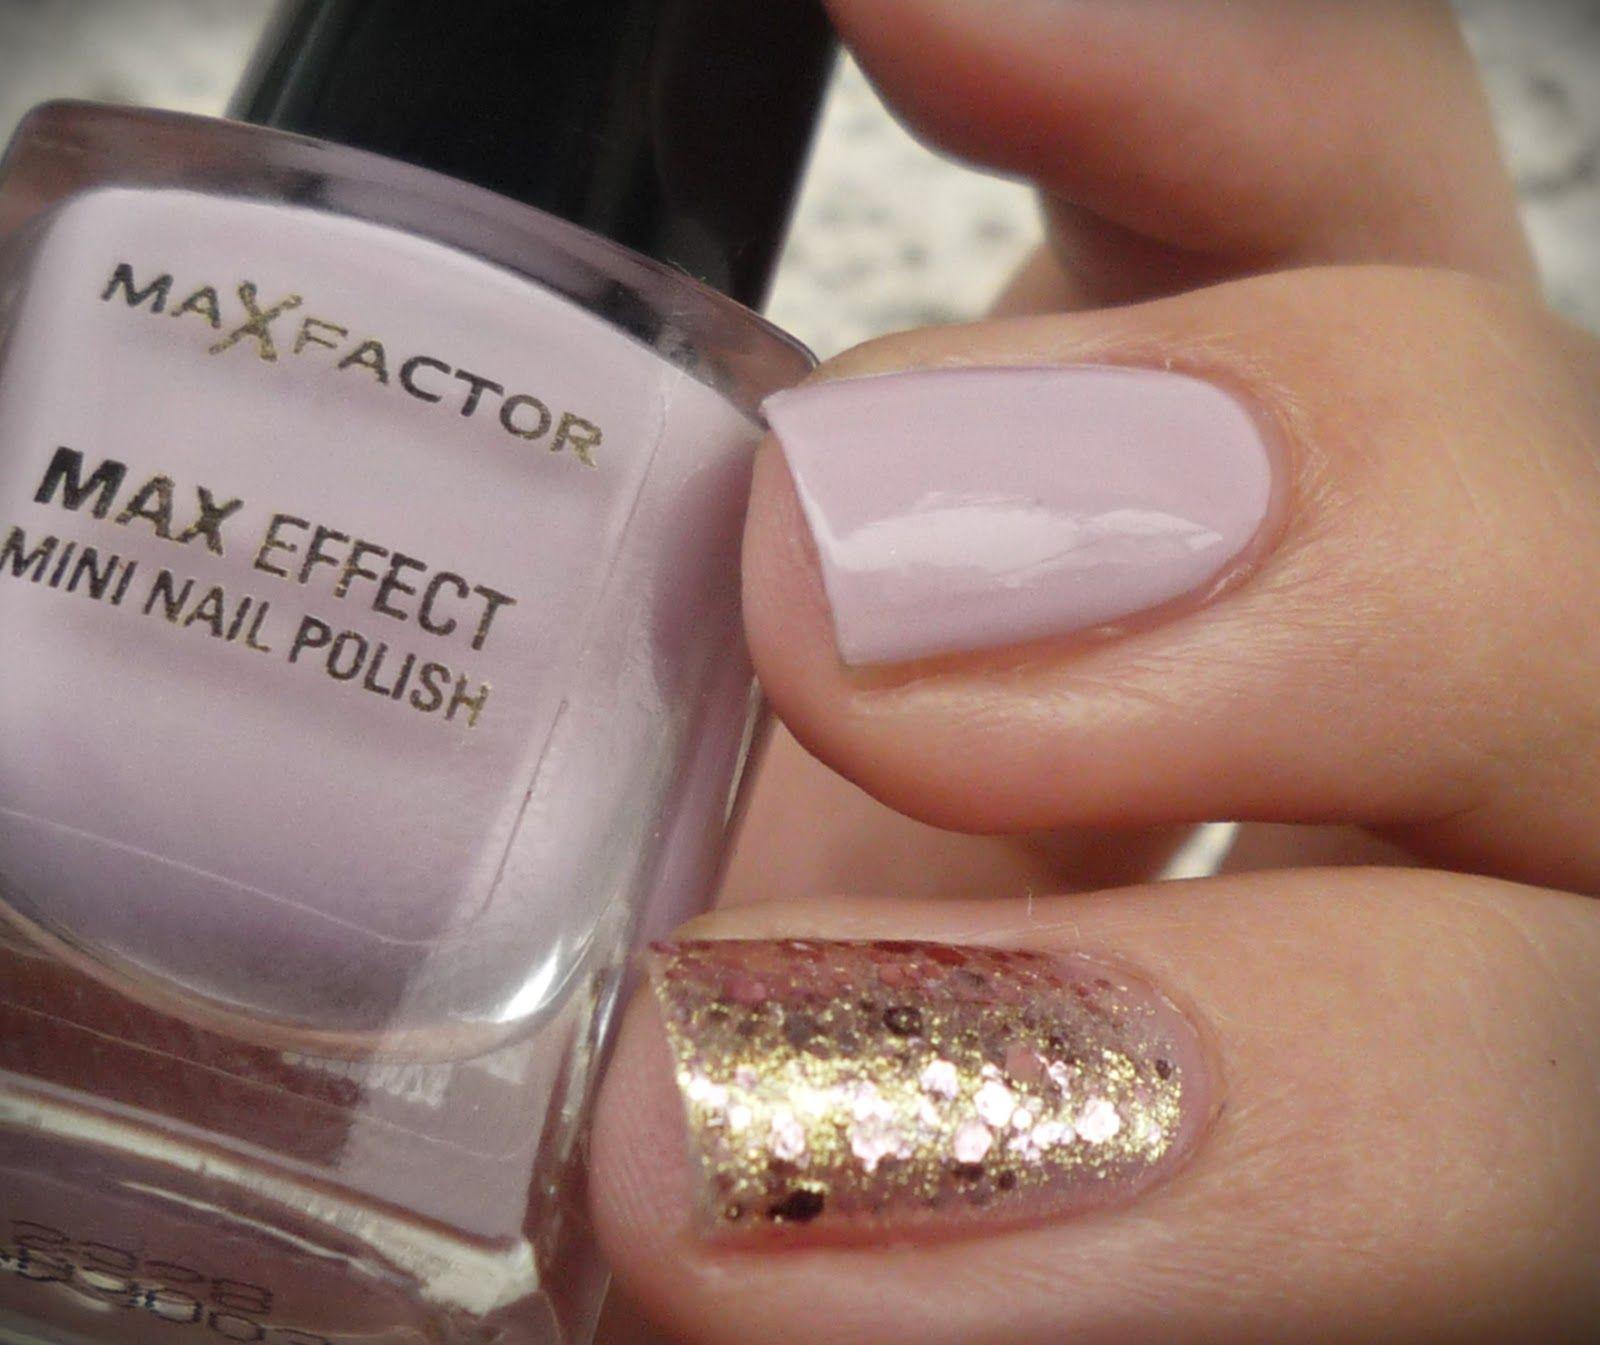 Maly Koutek Krasy Max Factor Max Effect Mini Nail Polish 30 Chilled Lilac Maybelline Brocades C 220 Aneb Vazne Povedena Dvojka Nail Polish Nails Polish